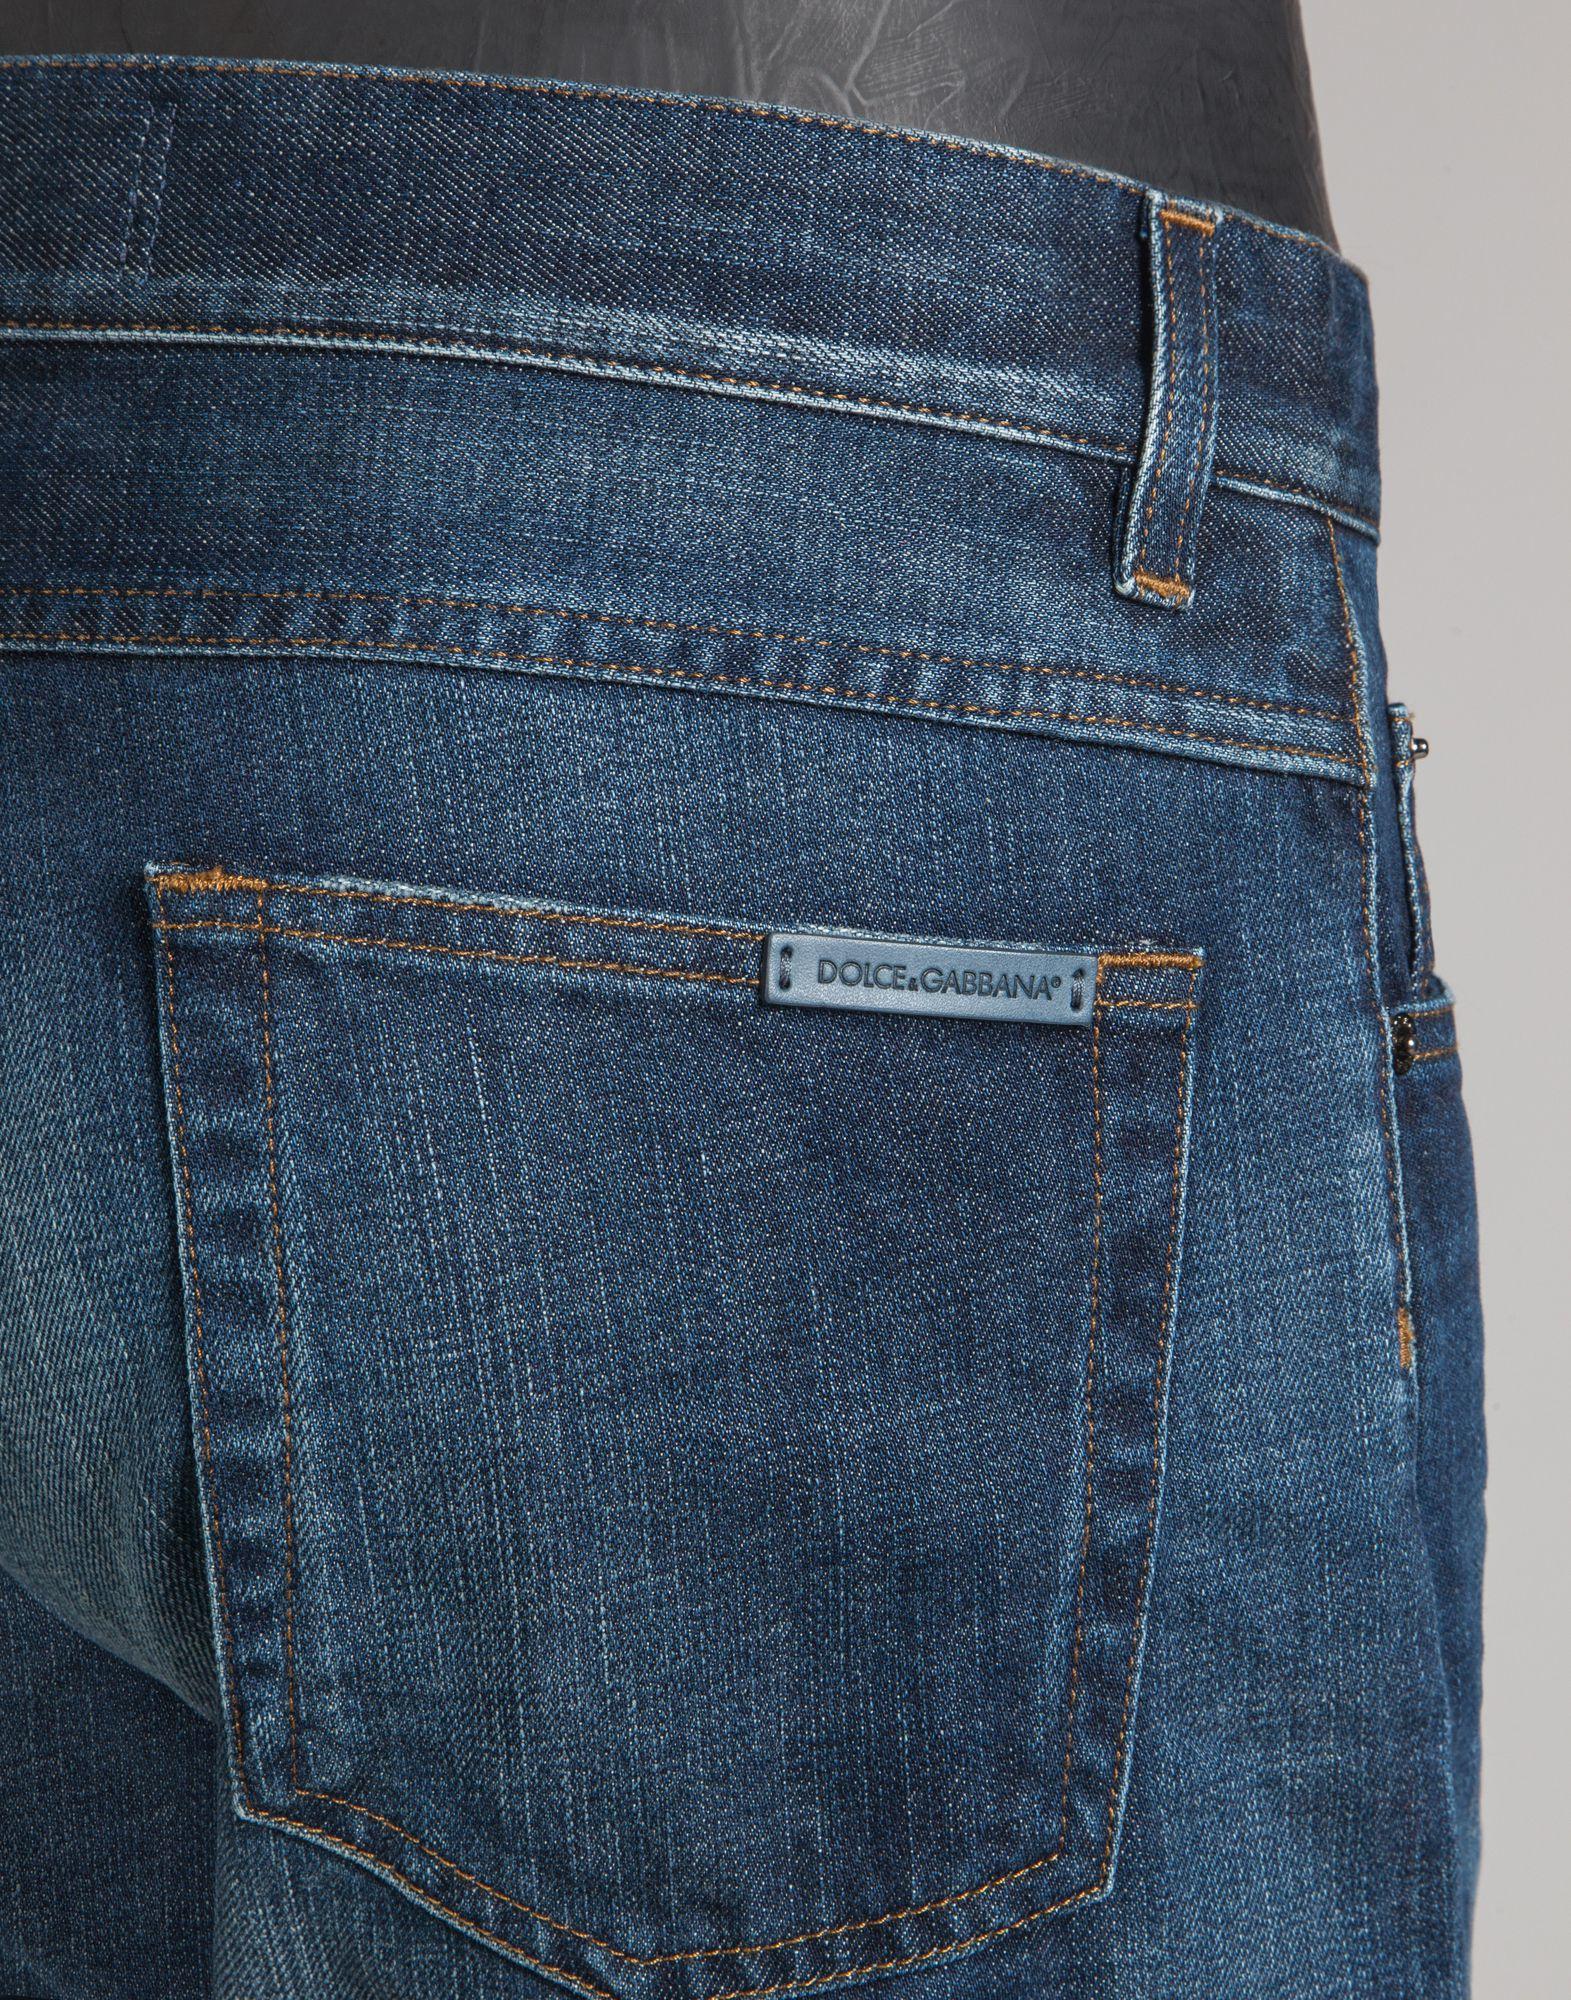 classic jeans - Blue Dolce & Gabbana yGXd559